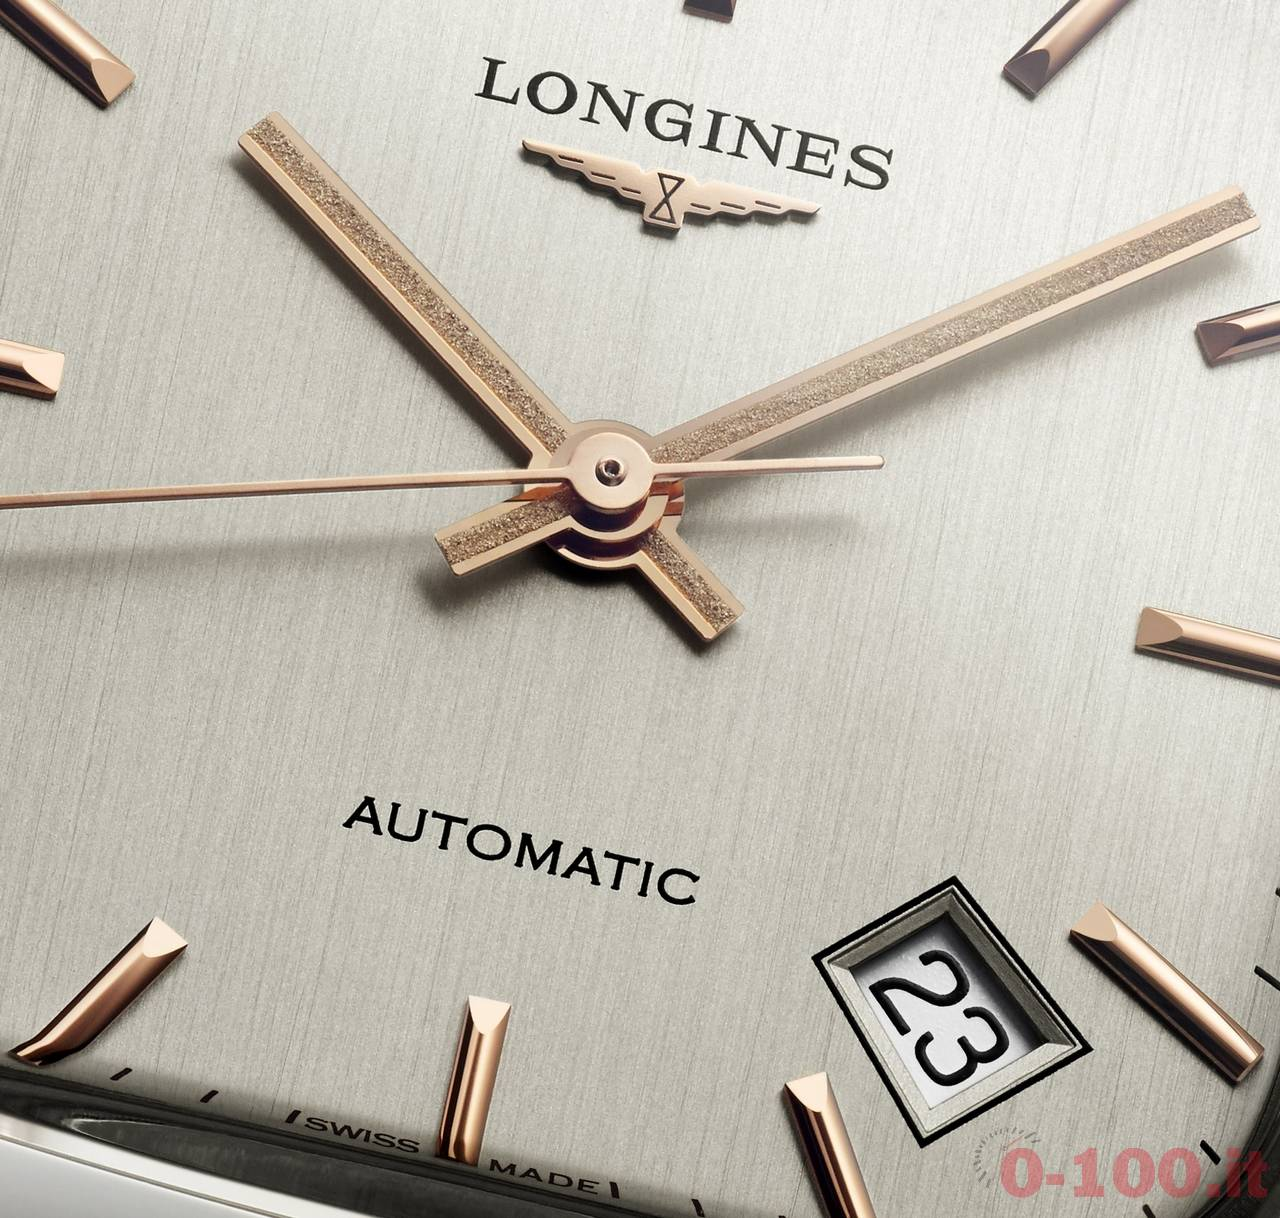 the-longines-heritage-1969-ref-l2-310-4-72-03-prezzo-price_0-1003